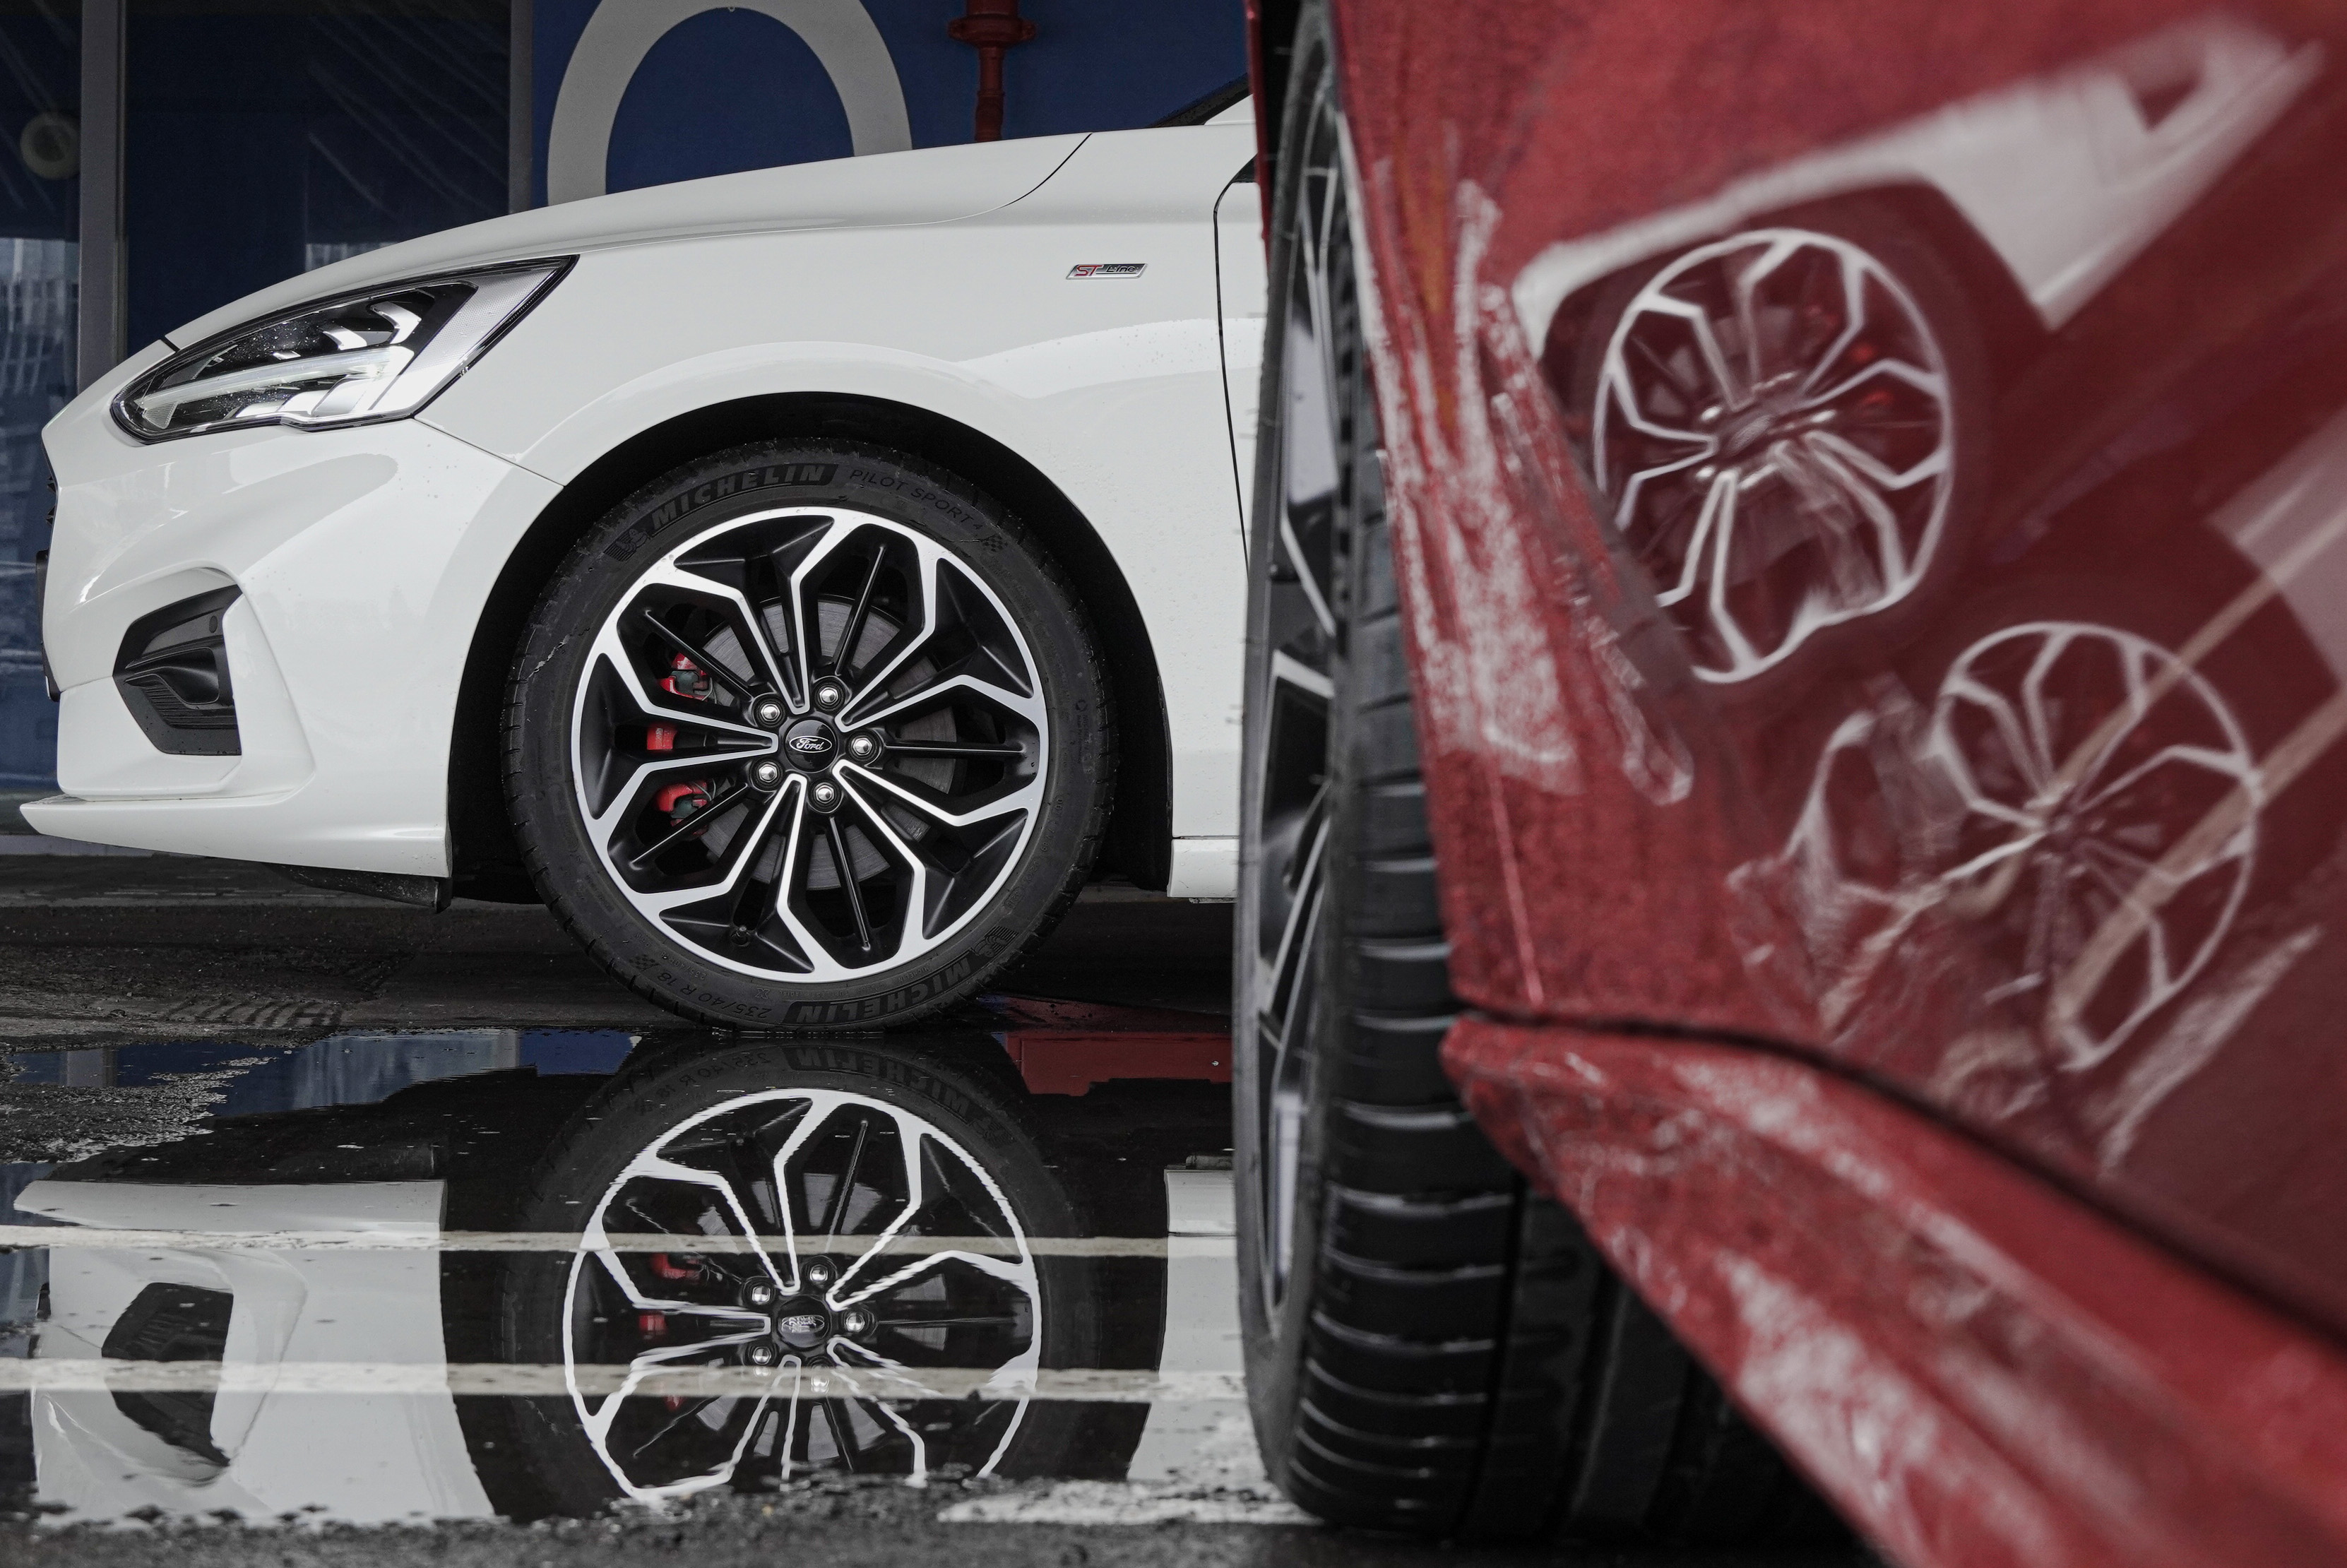 Lommel、ST-Line 同樣腳踩 235/40 R18 Michelin Pilot Sport 4 高性能跑胎。